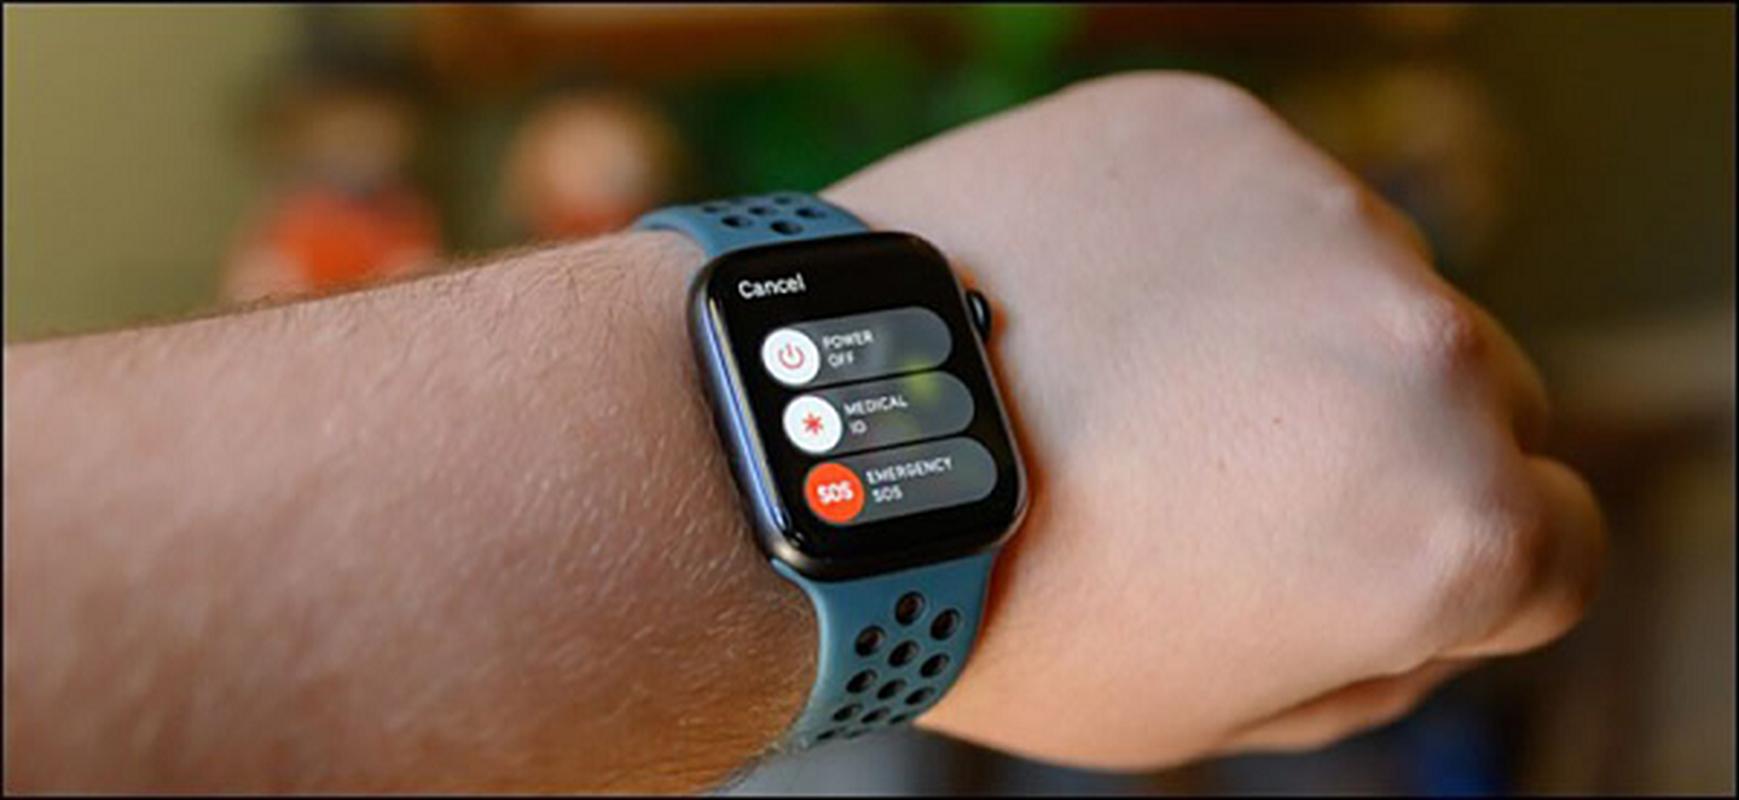 Apple Watch lai vua cuu song mot nguoi bi lu cuon troi-Hinh-2